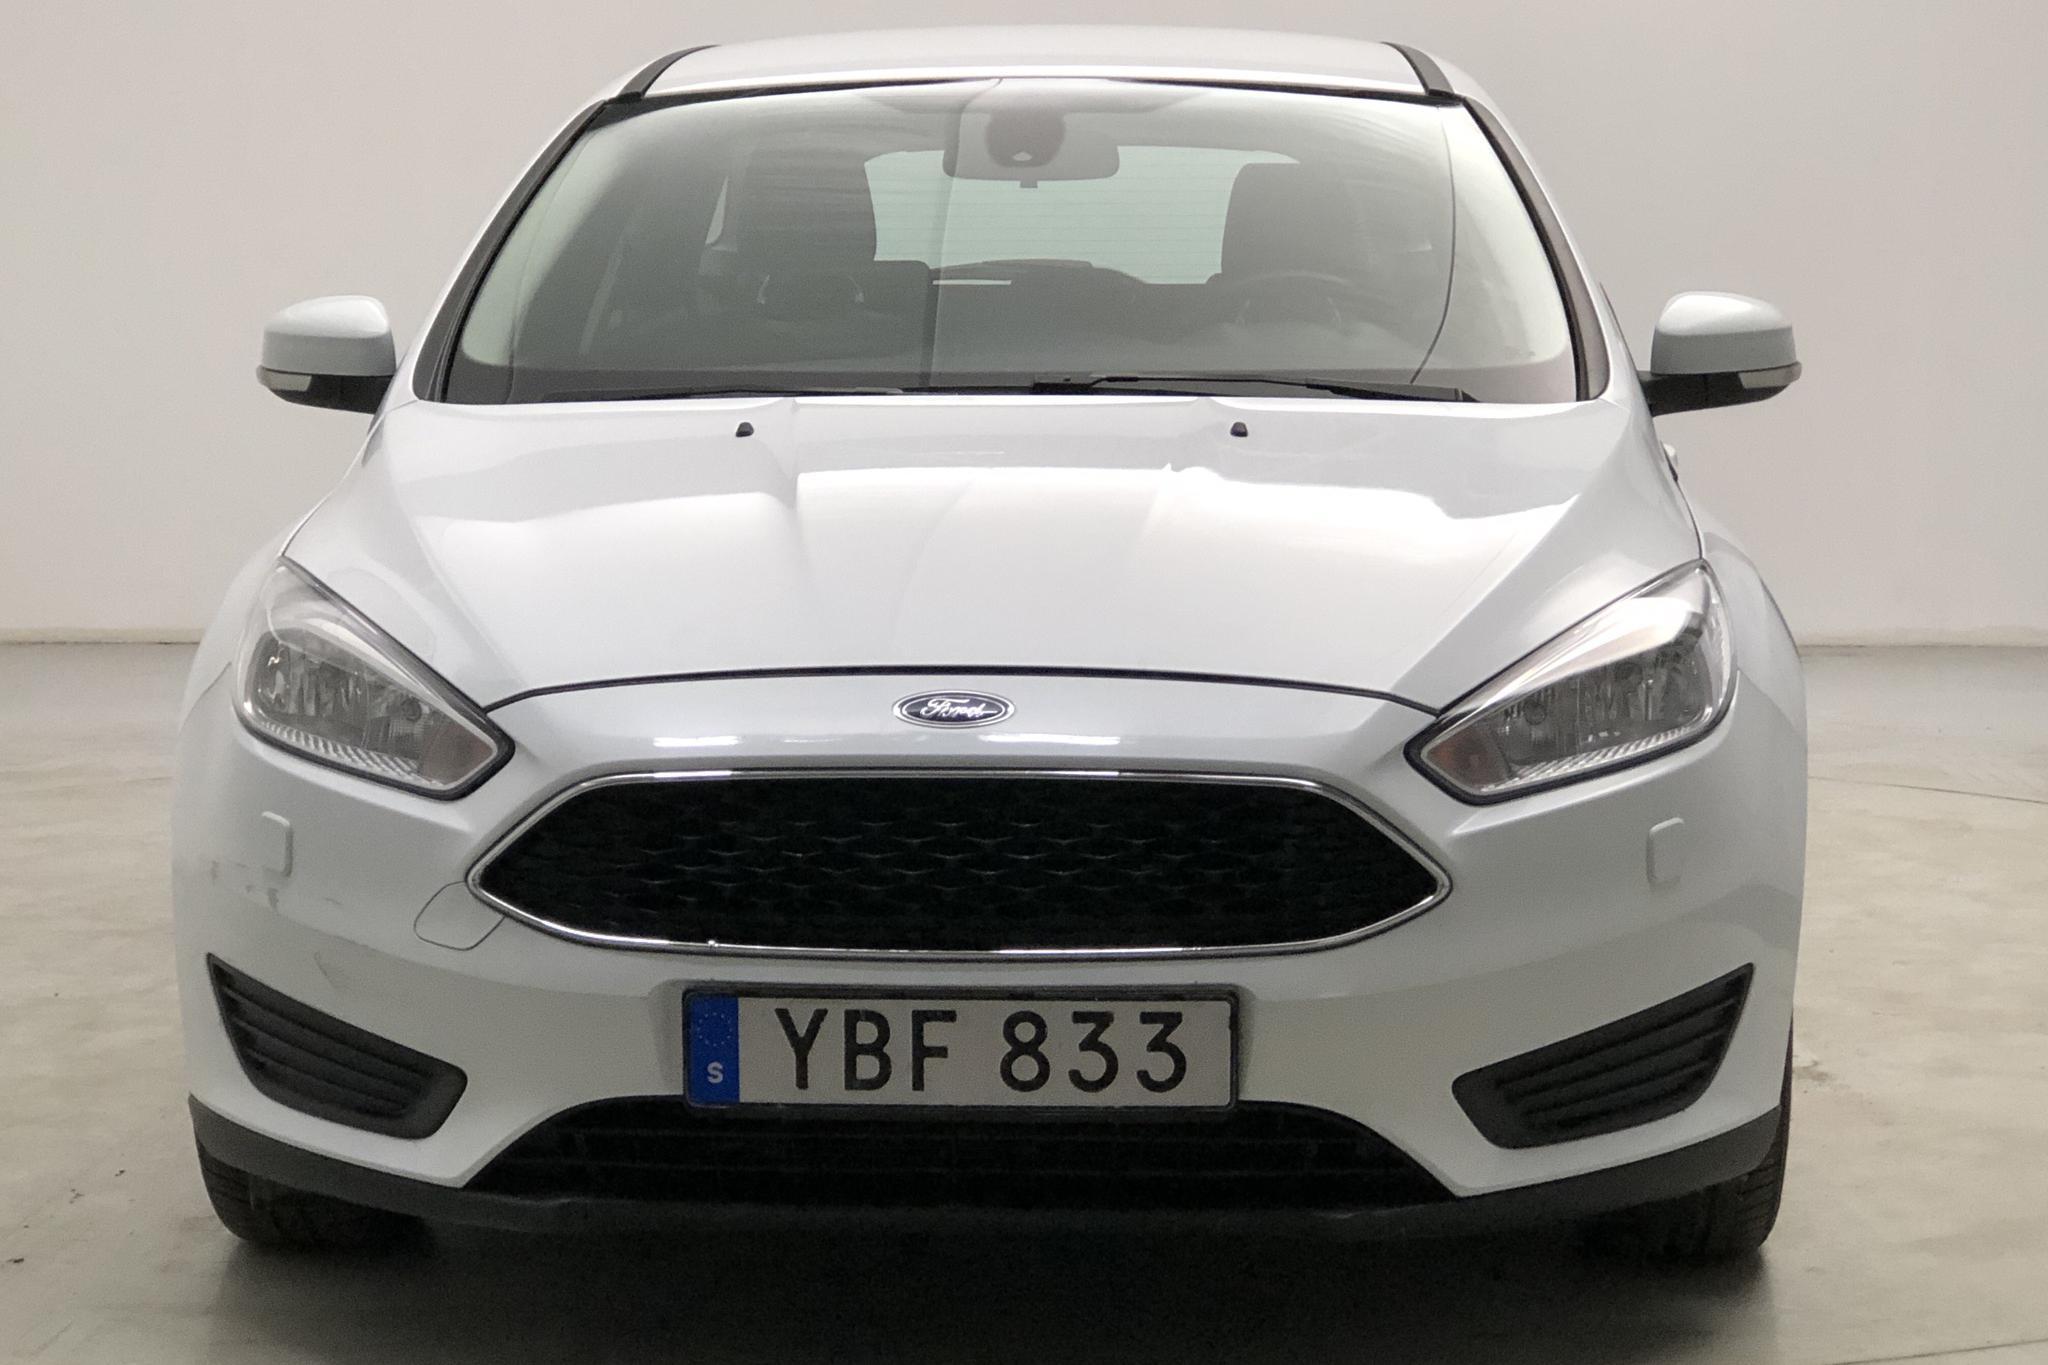 Ford Focus 1.5 TDCi Kombi (95hk) - 266 650 km - Manual - white - 2016